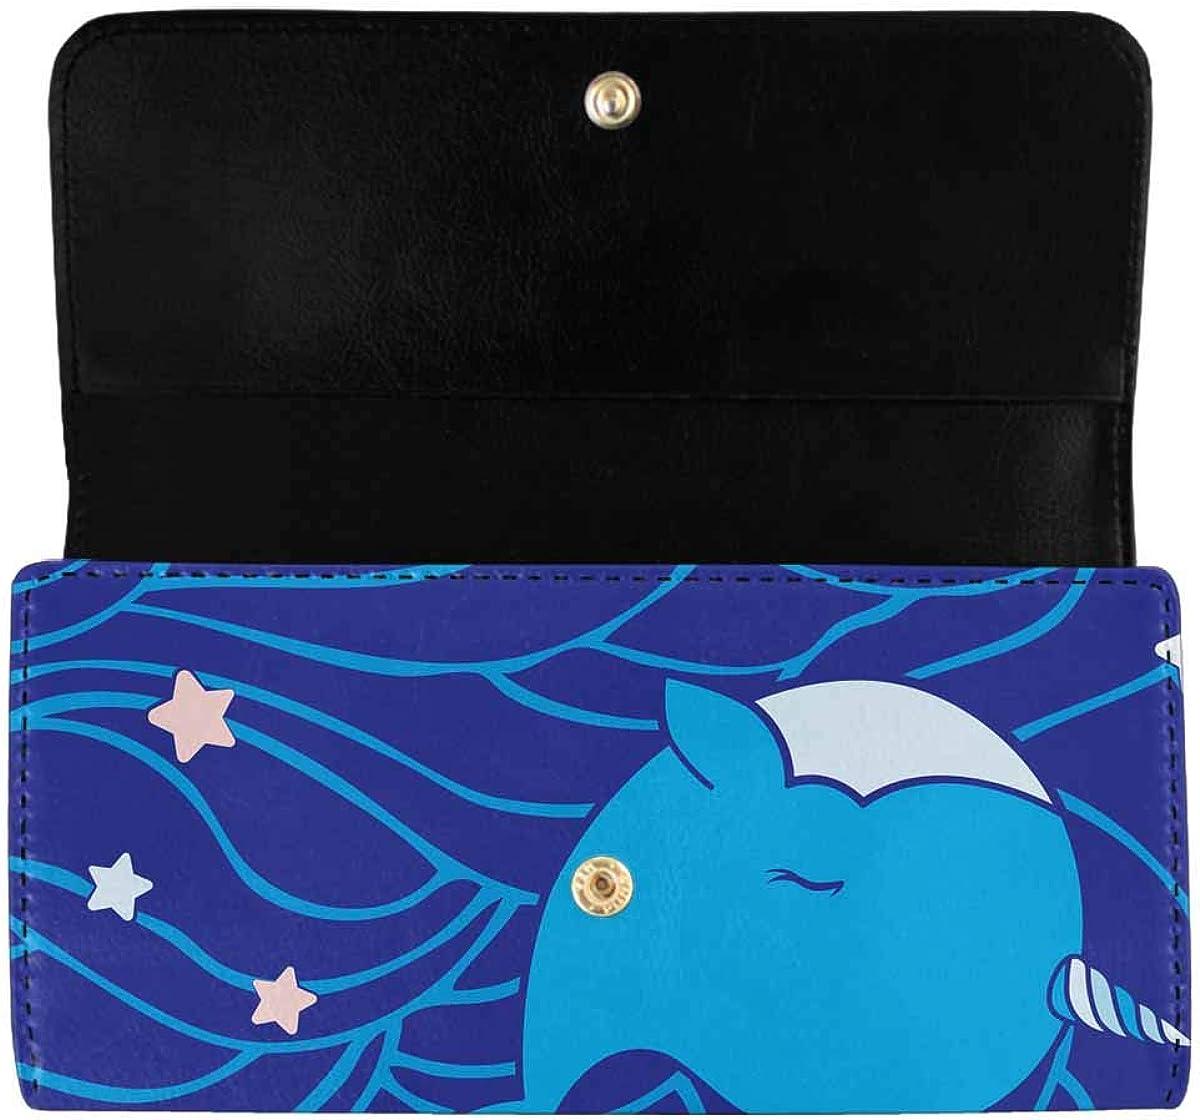 INTERESTPRINT Women's Trifold Clutch Purses Unicorn Stars and Waves Pattern Long Card Holder Handbags